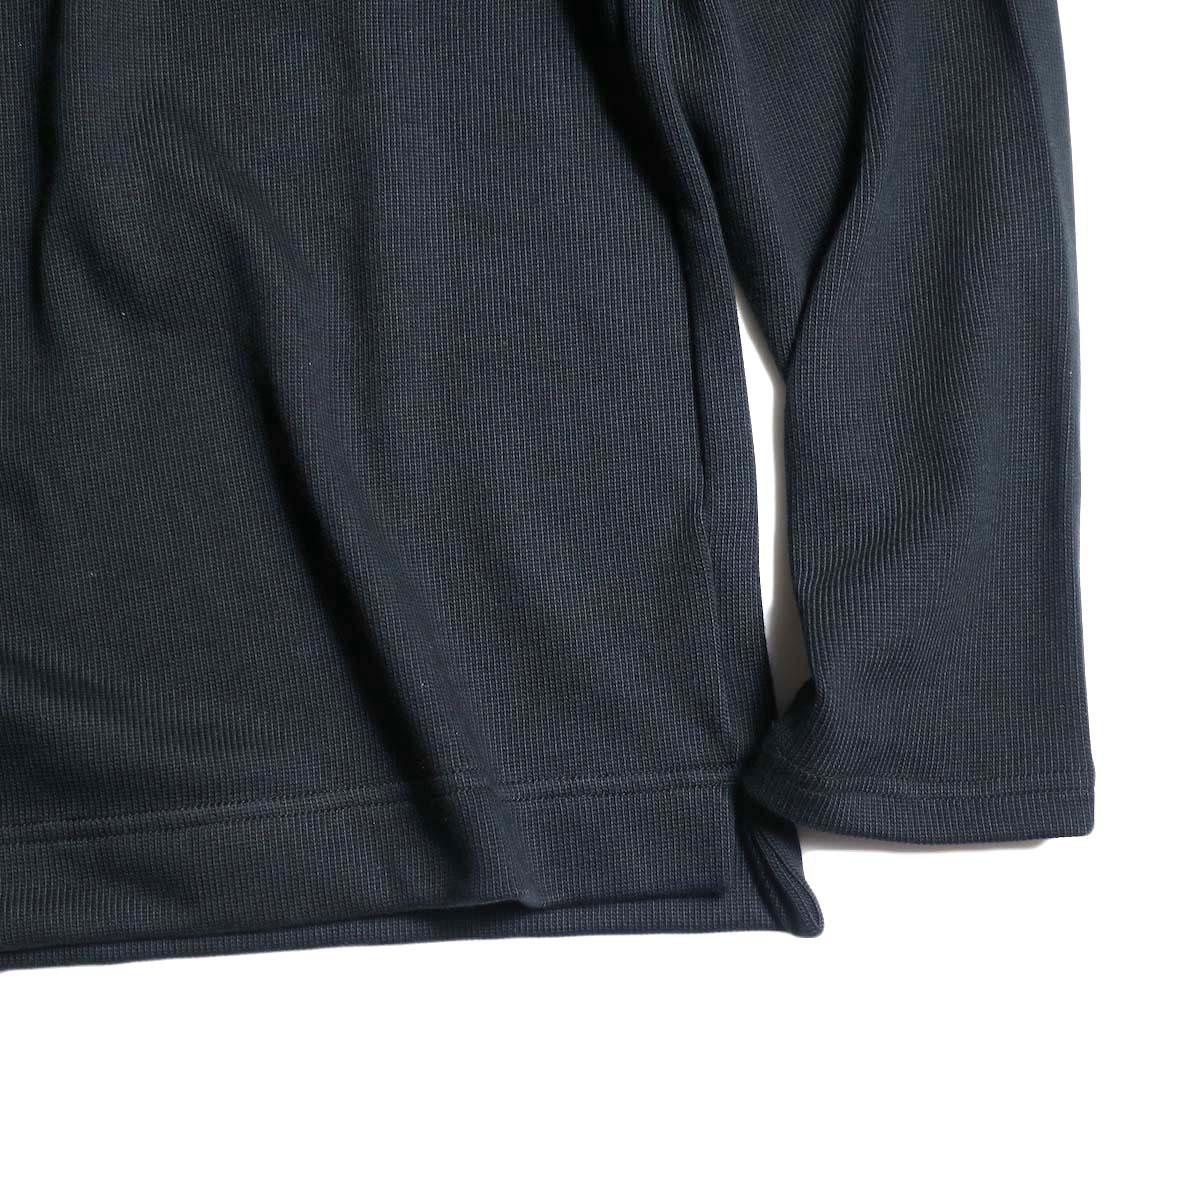 Jackman / Heavy Pima Crewneck (Black) 裾、袖